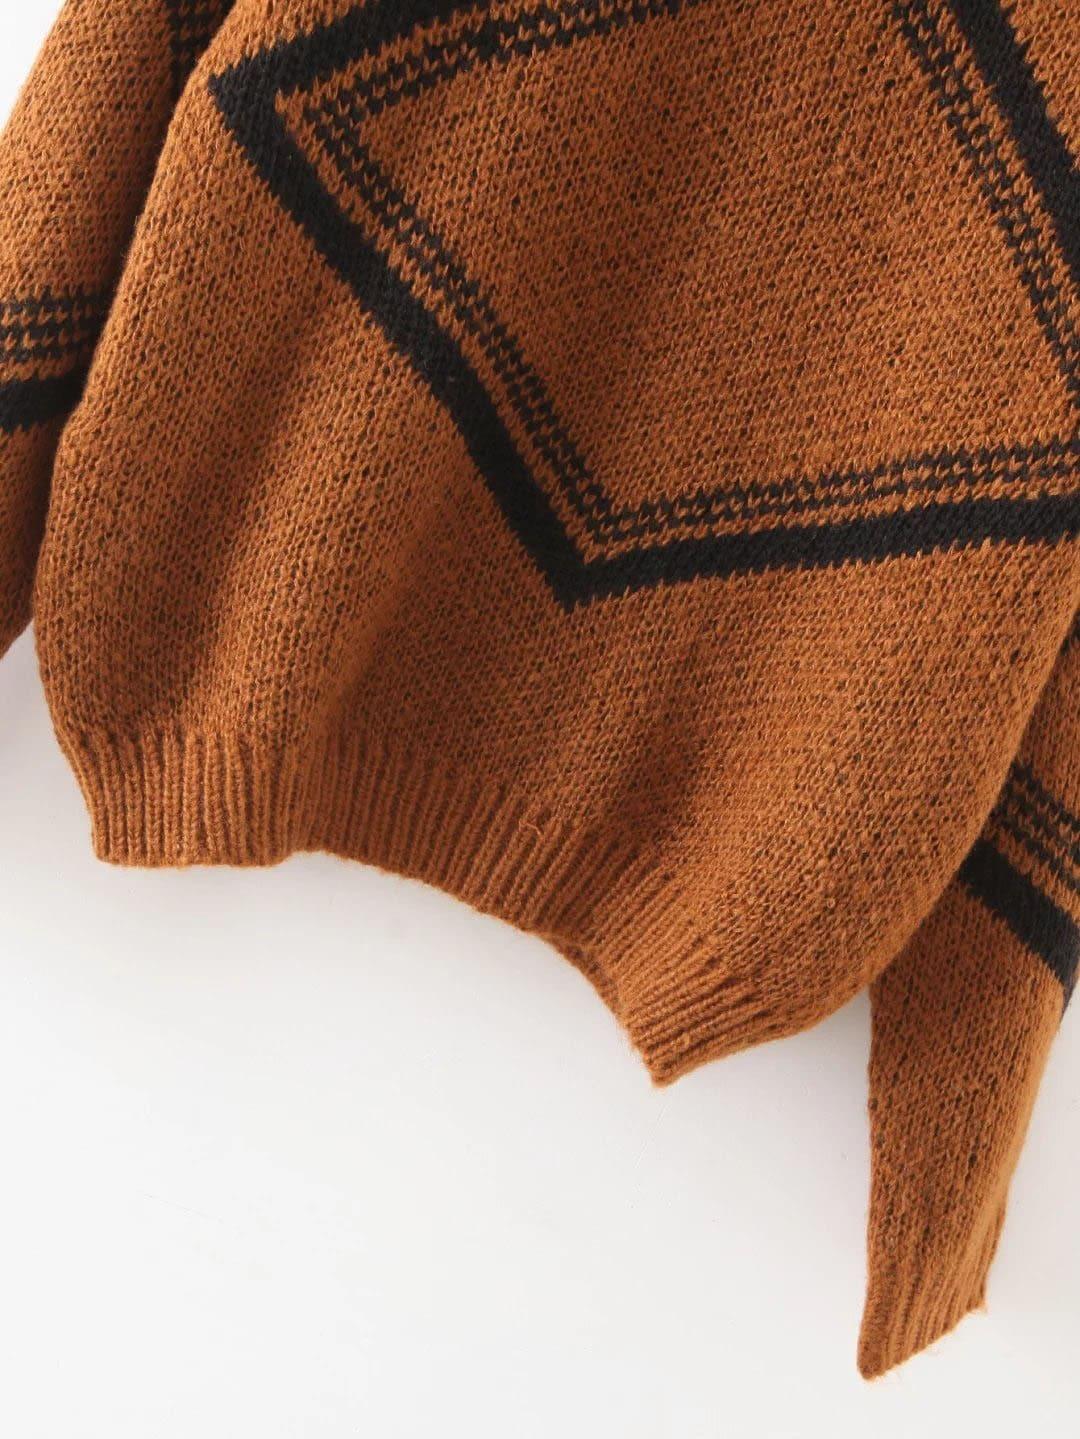 sweater160920235_2